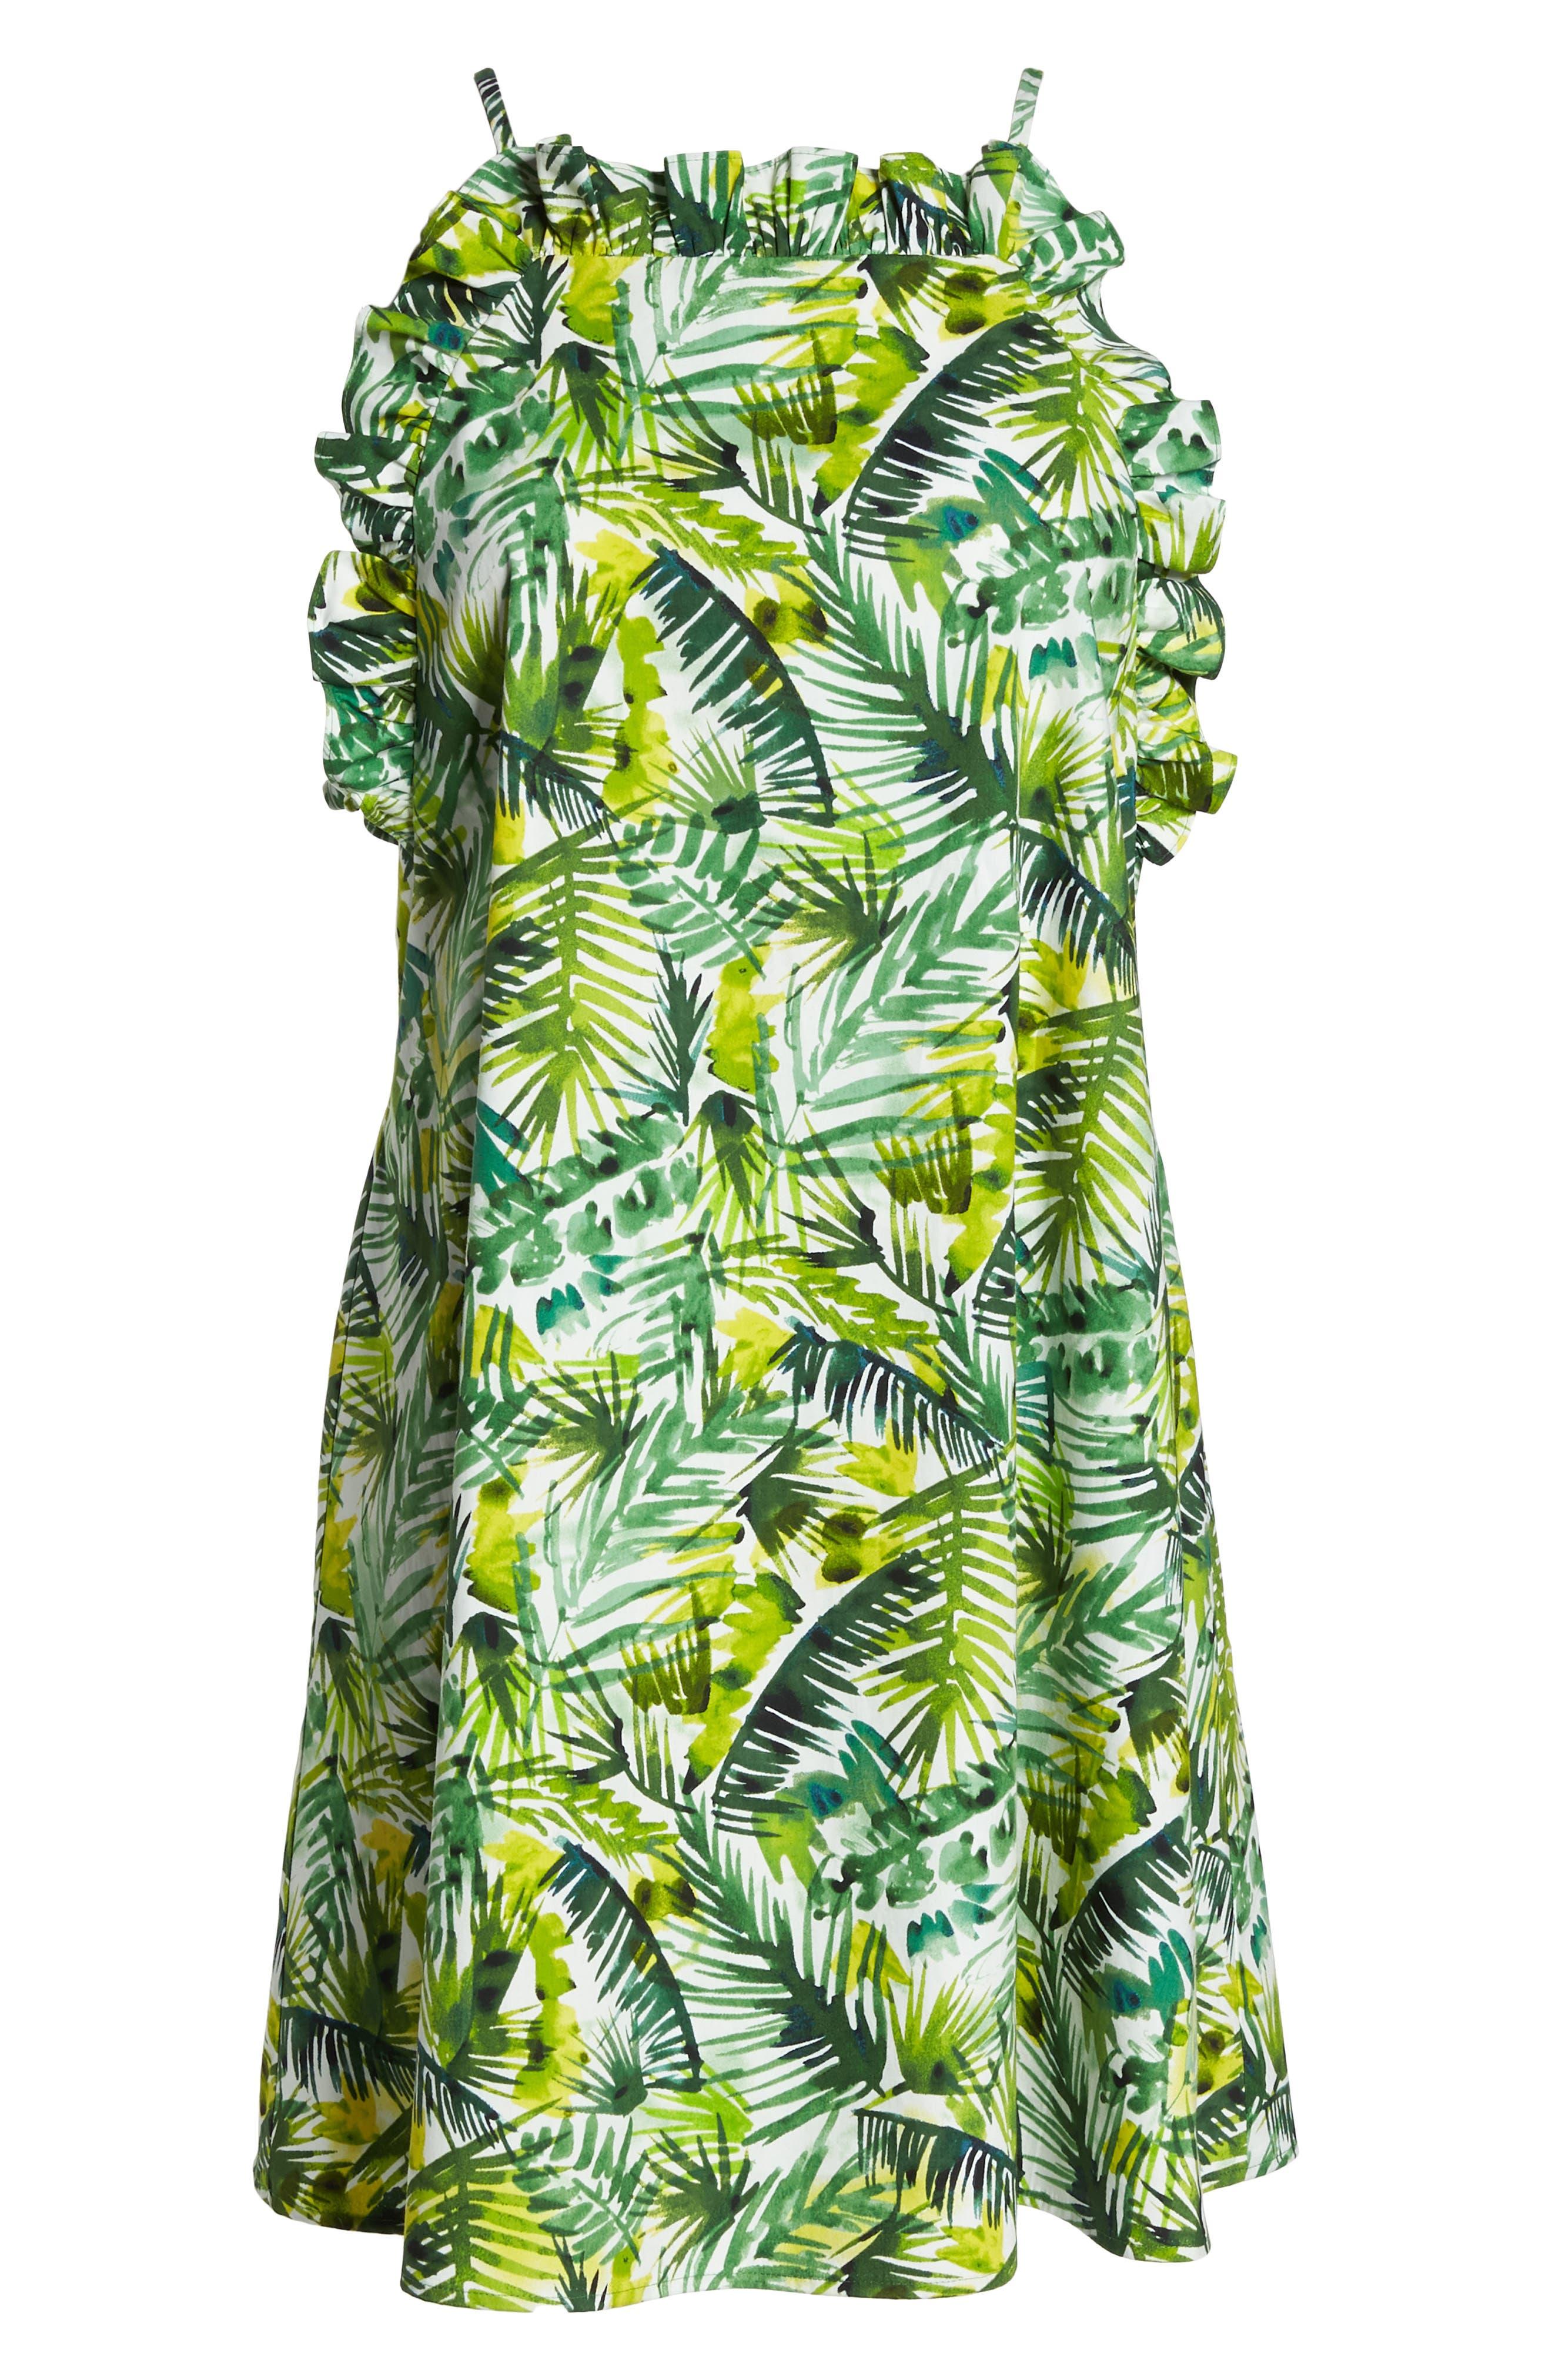 Ruffle Top Shift Dress,                             Alternate thumbnail 7, color,                             Soft White/ Green